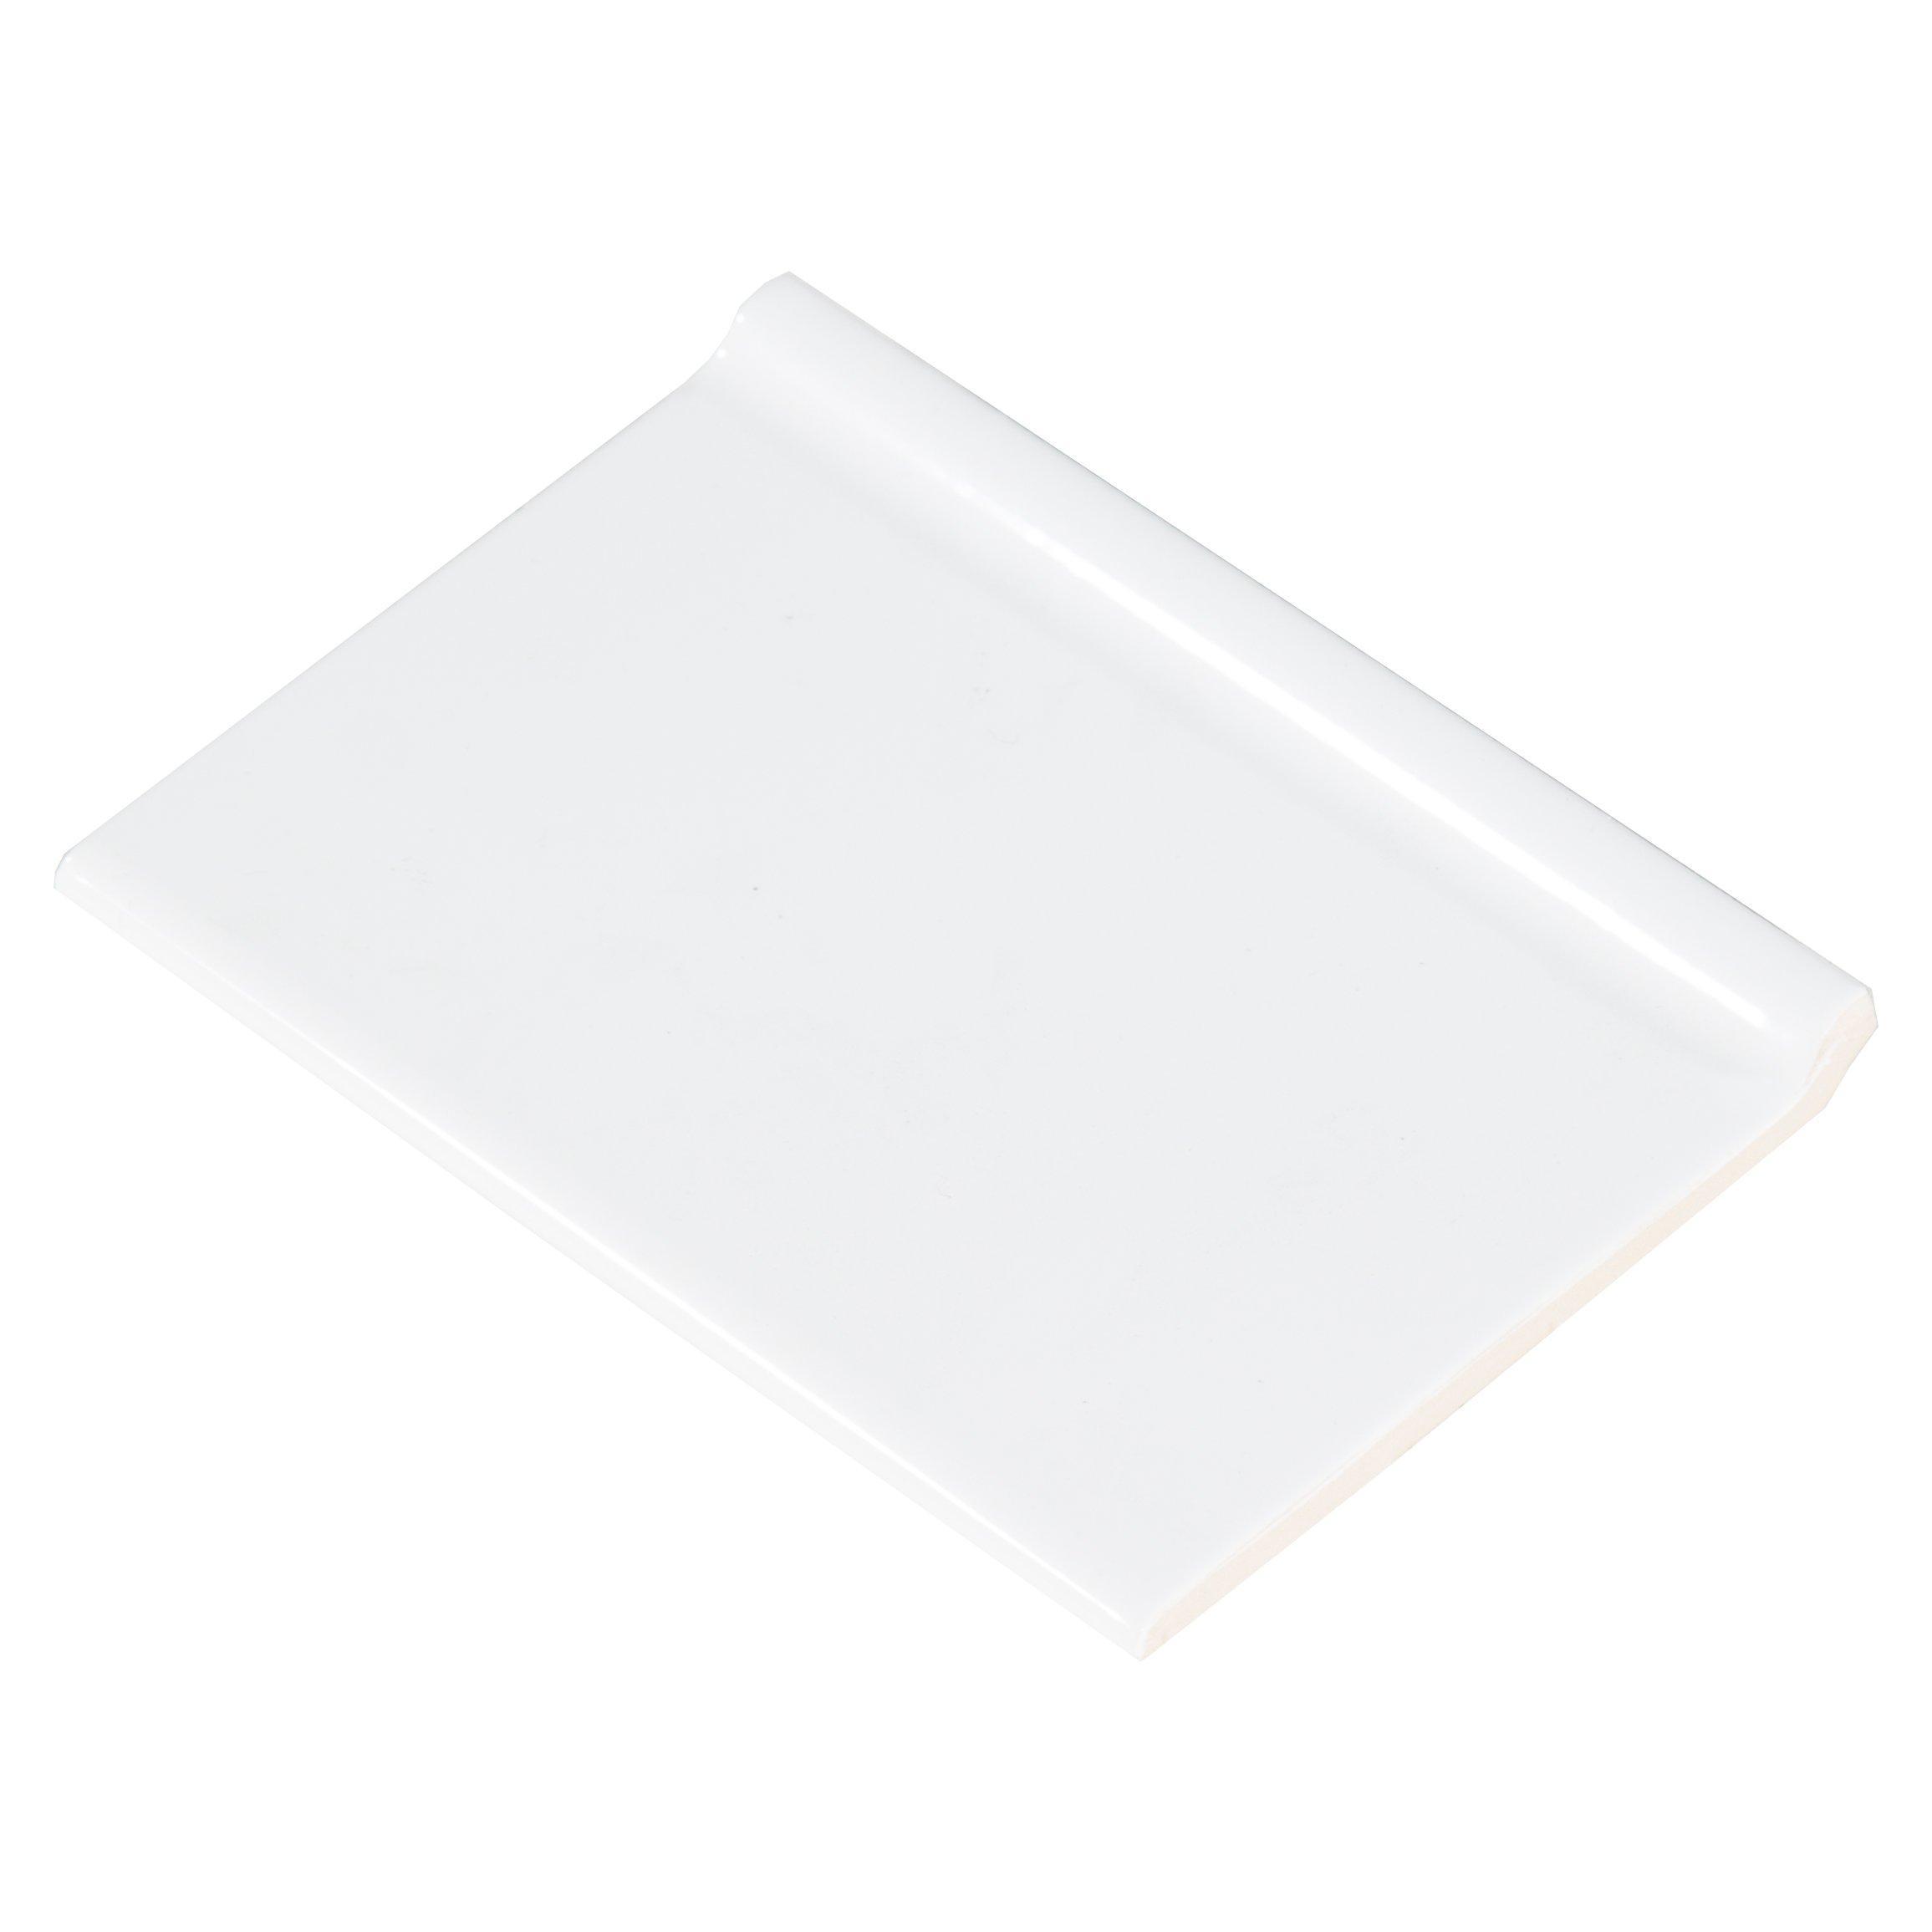 bright white ice ceramic cove base